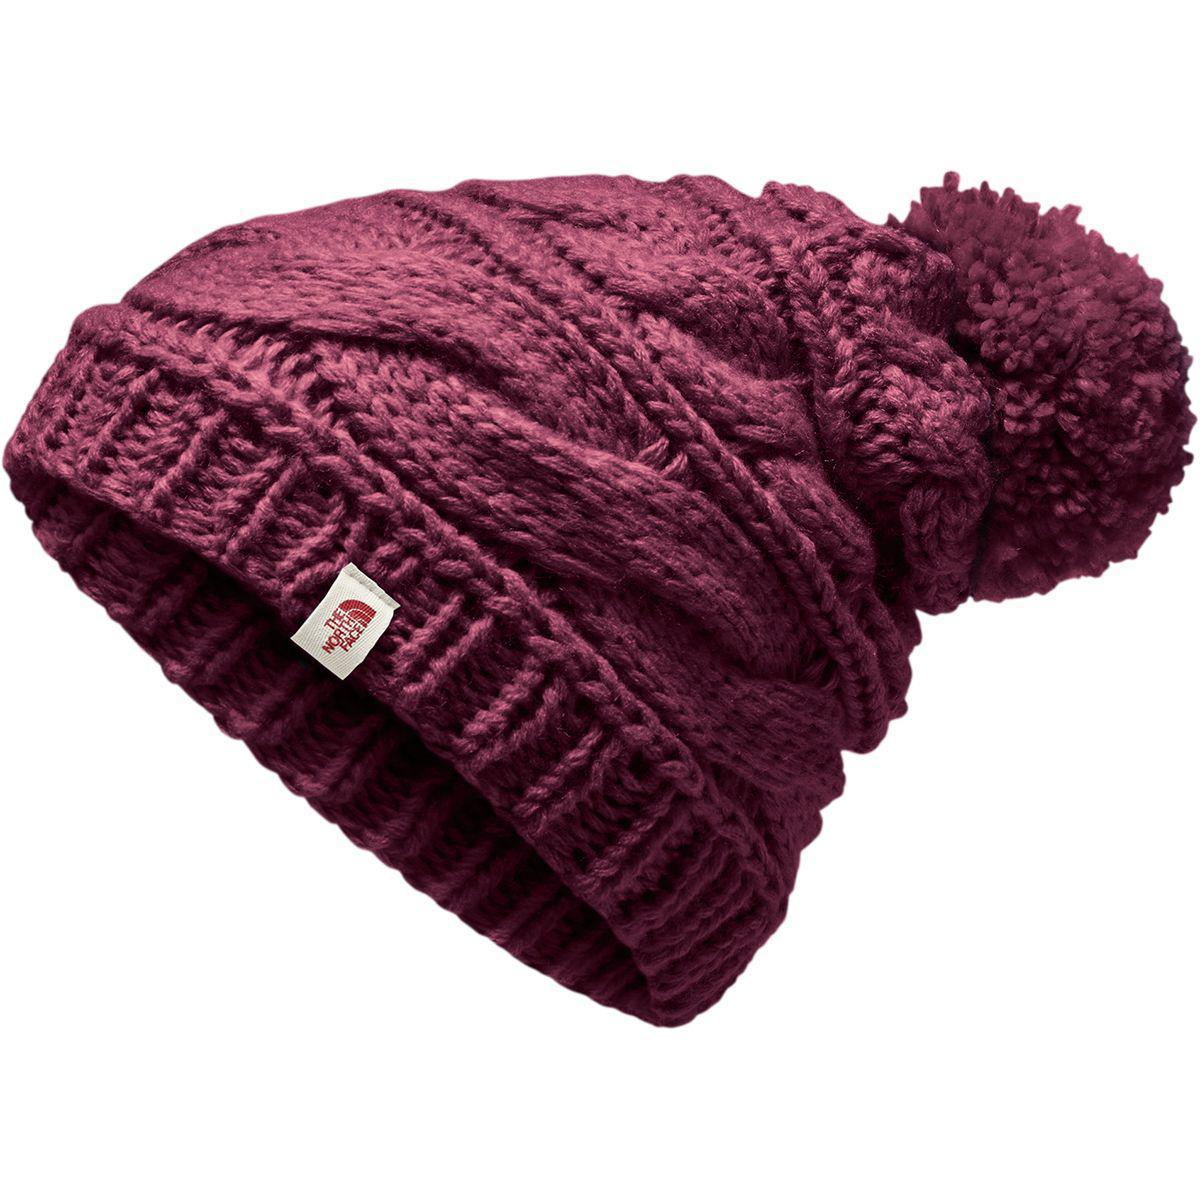 8e8a6e03199 Lyst - The North Face Triple Cable Pom Beanie in Purple for Men